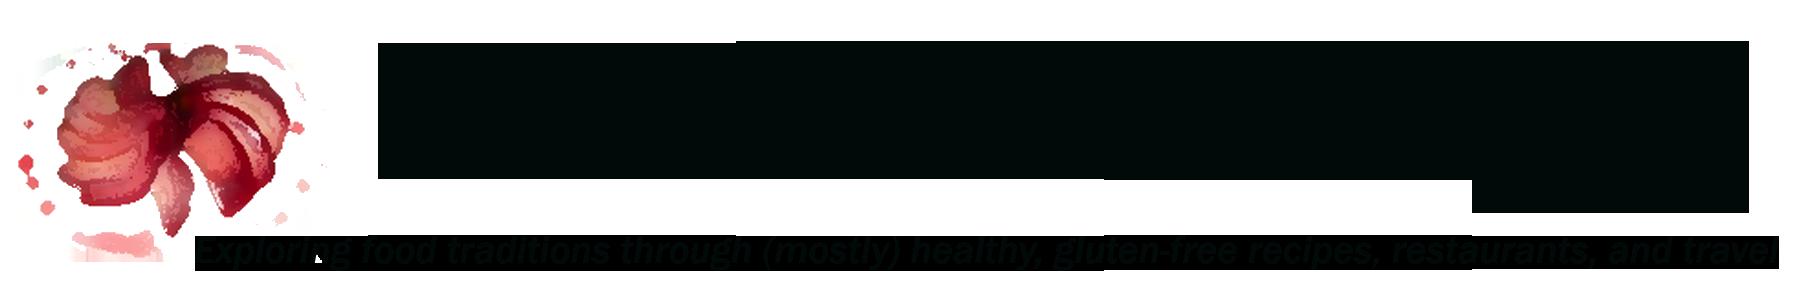 Multiculturiosity